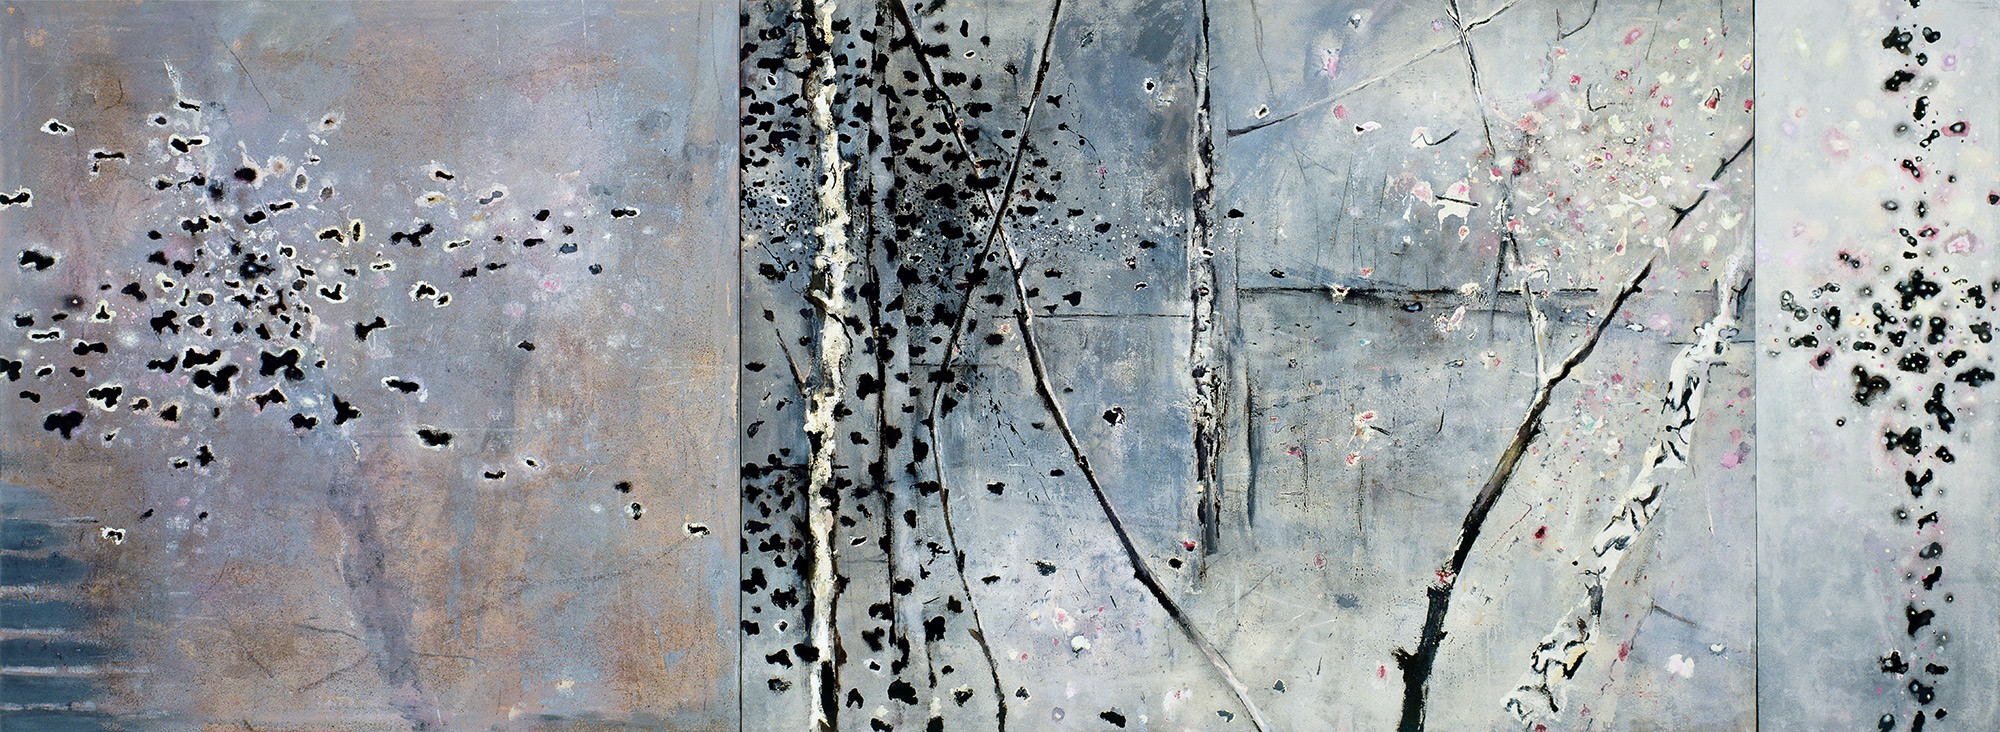 Aspen Triptych  1990-2000, 168 x 452 cm